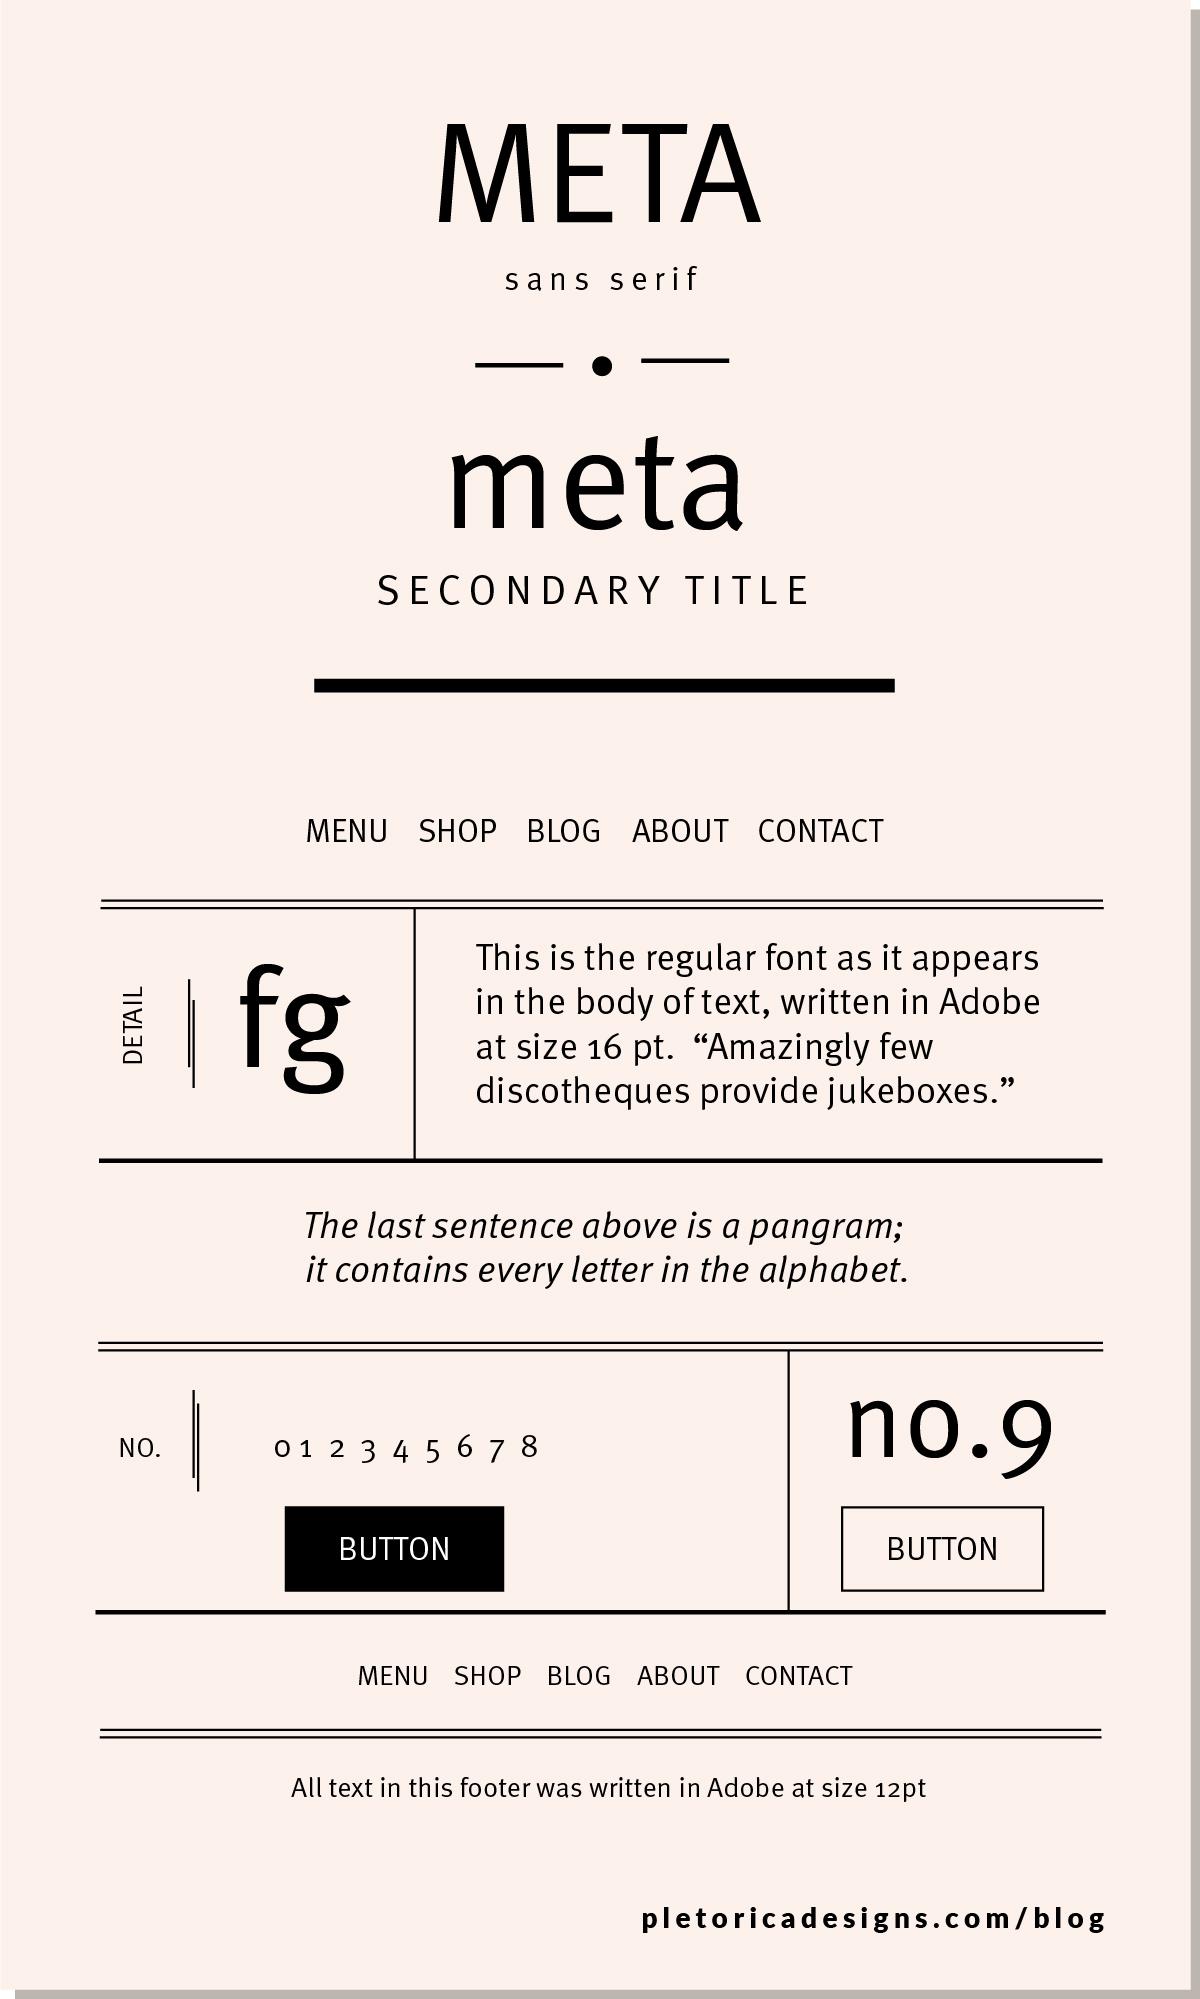 LET'S TYPE: Meta — PLETÓRICA DESIGNS